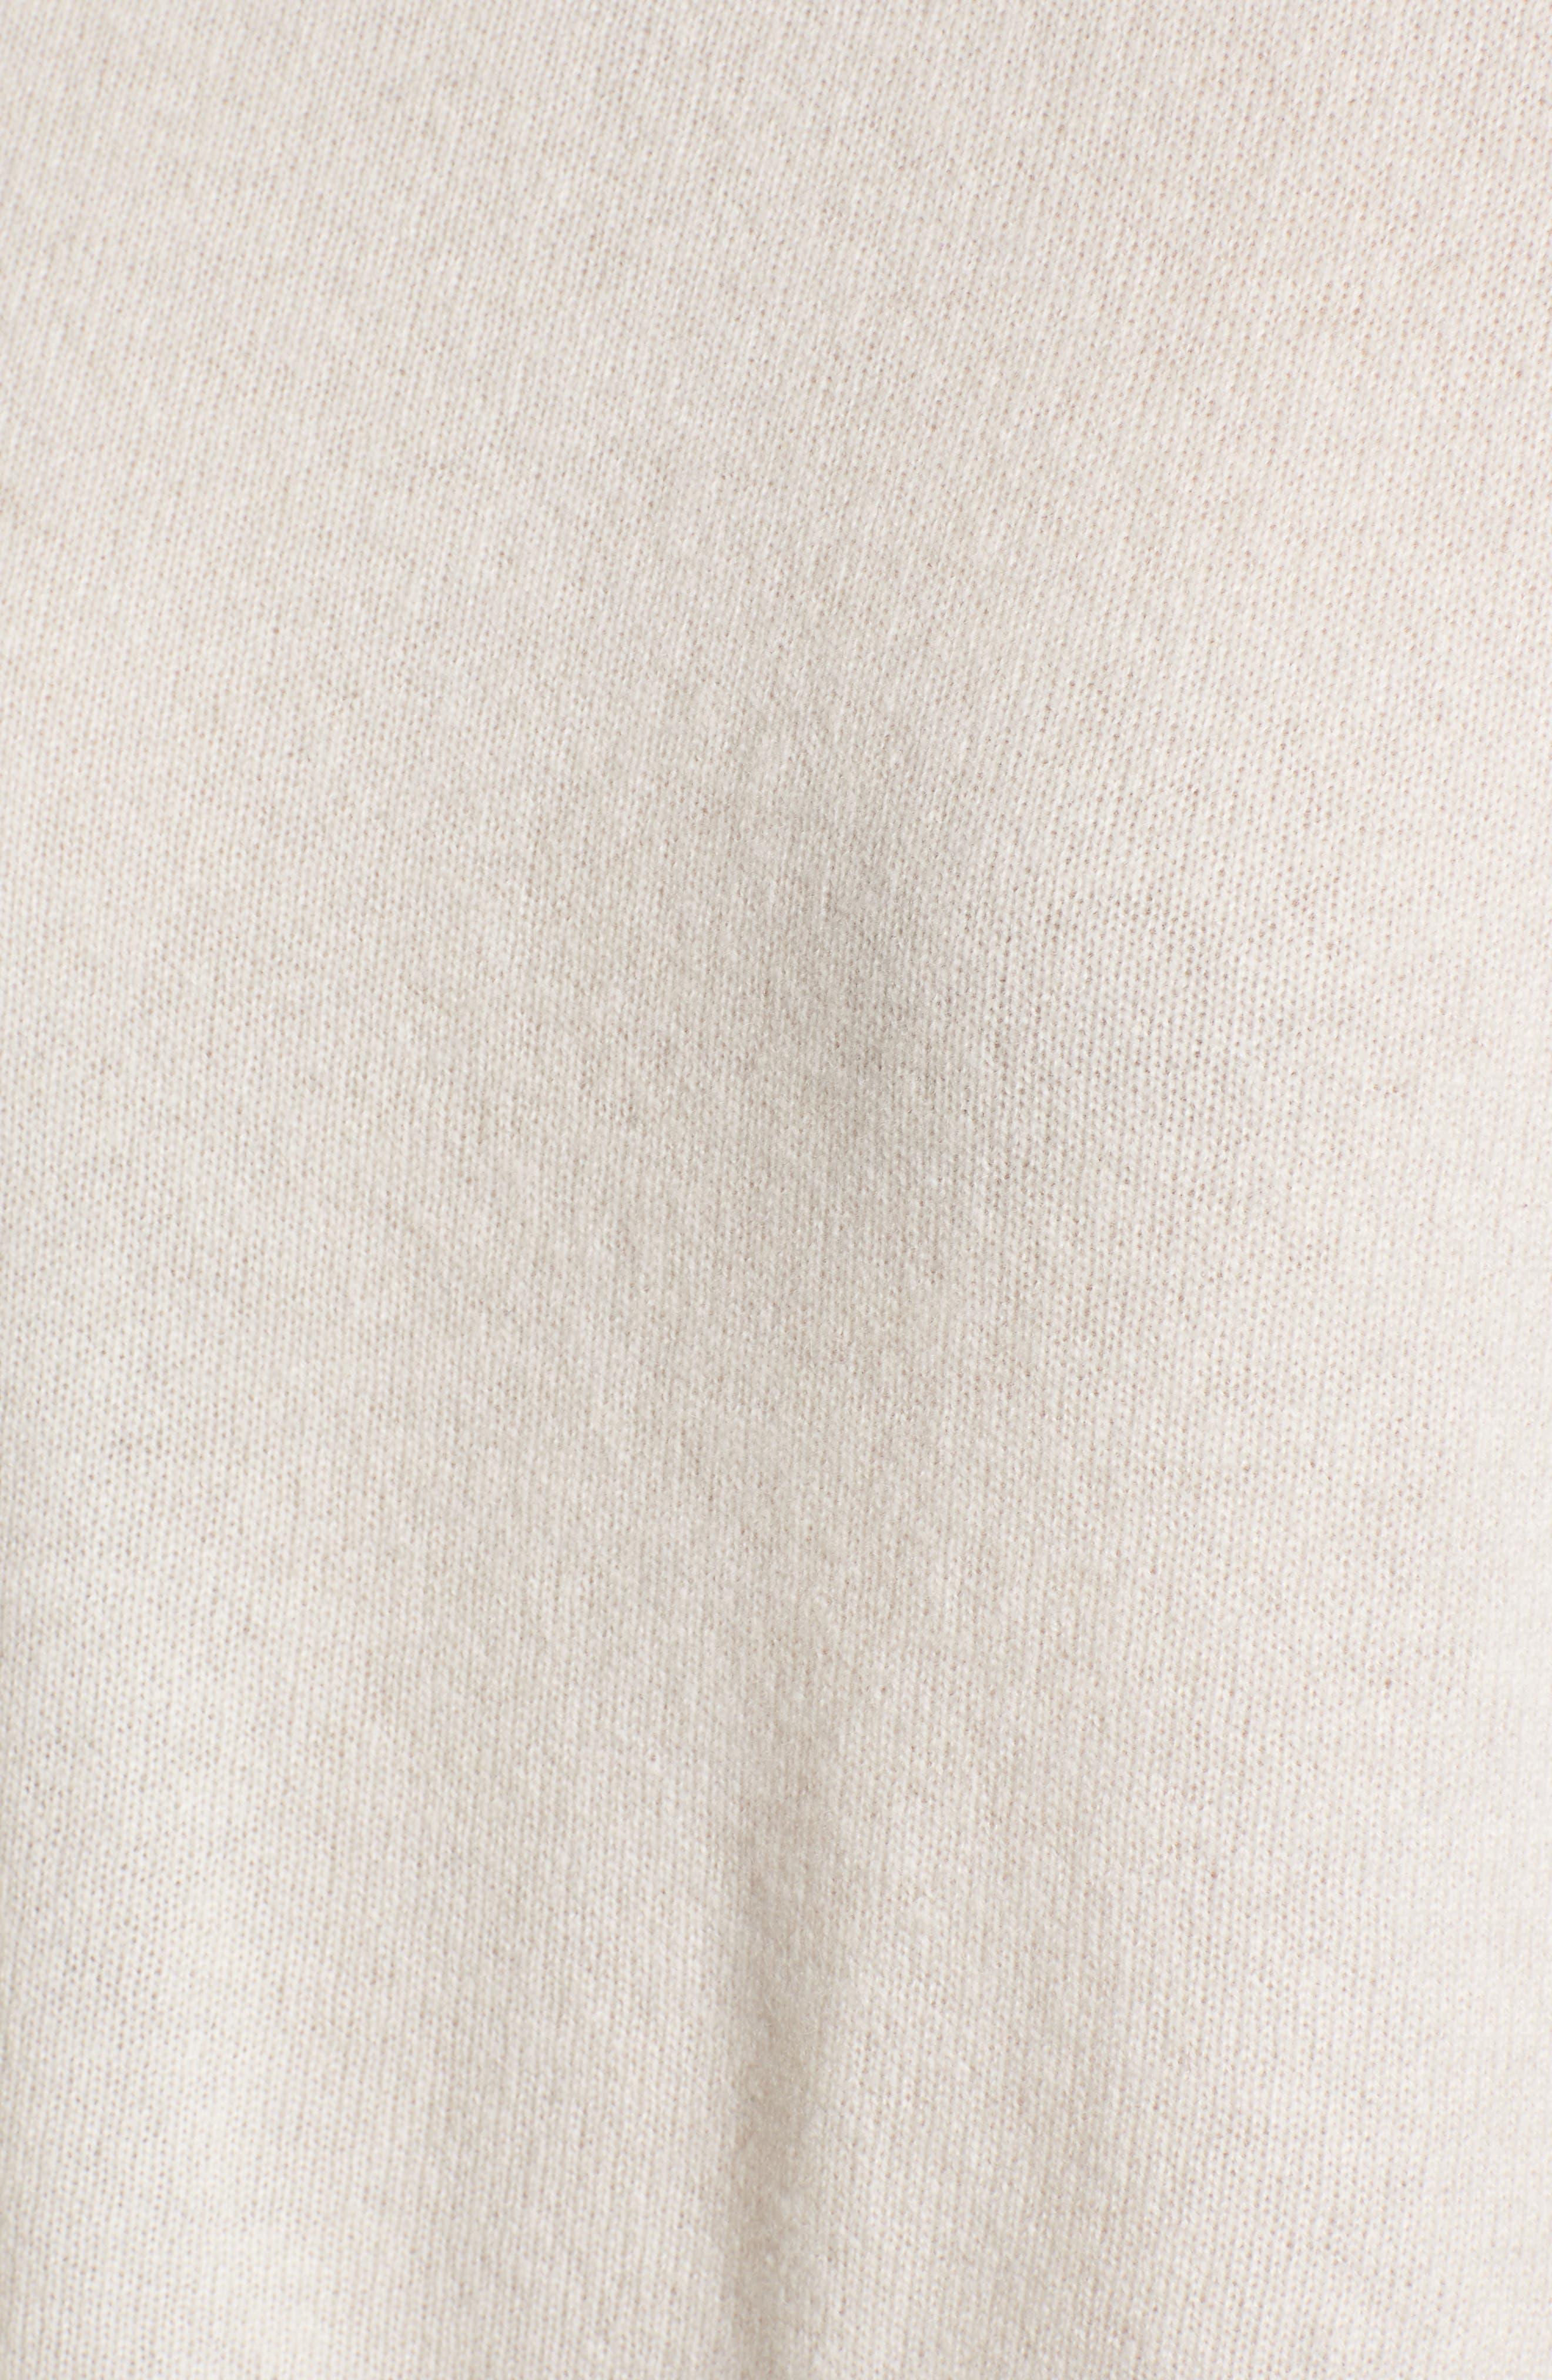 Button Detail Cashmere Sweater,                             Alternate thumbnail 5, color,                             Beige Pumice